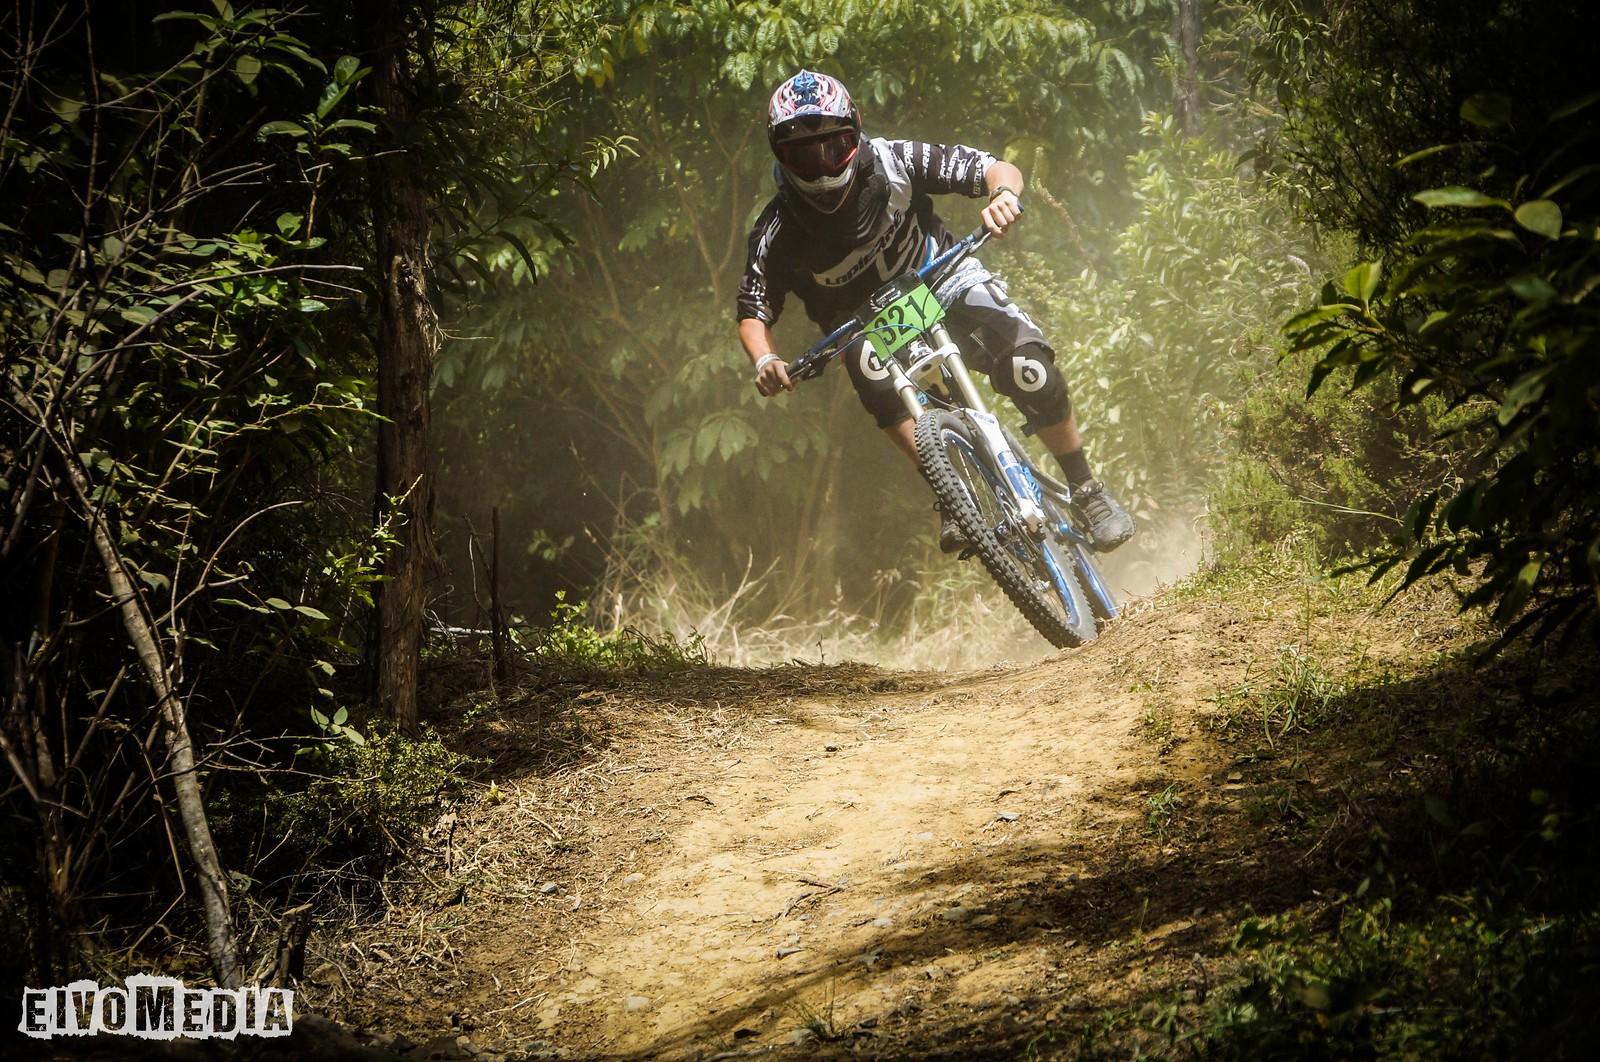 Hunua DH-7 - EIVOMEDIA - Mountain Biking Pictures - Vital MTB